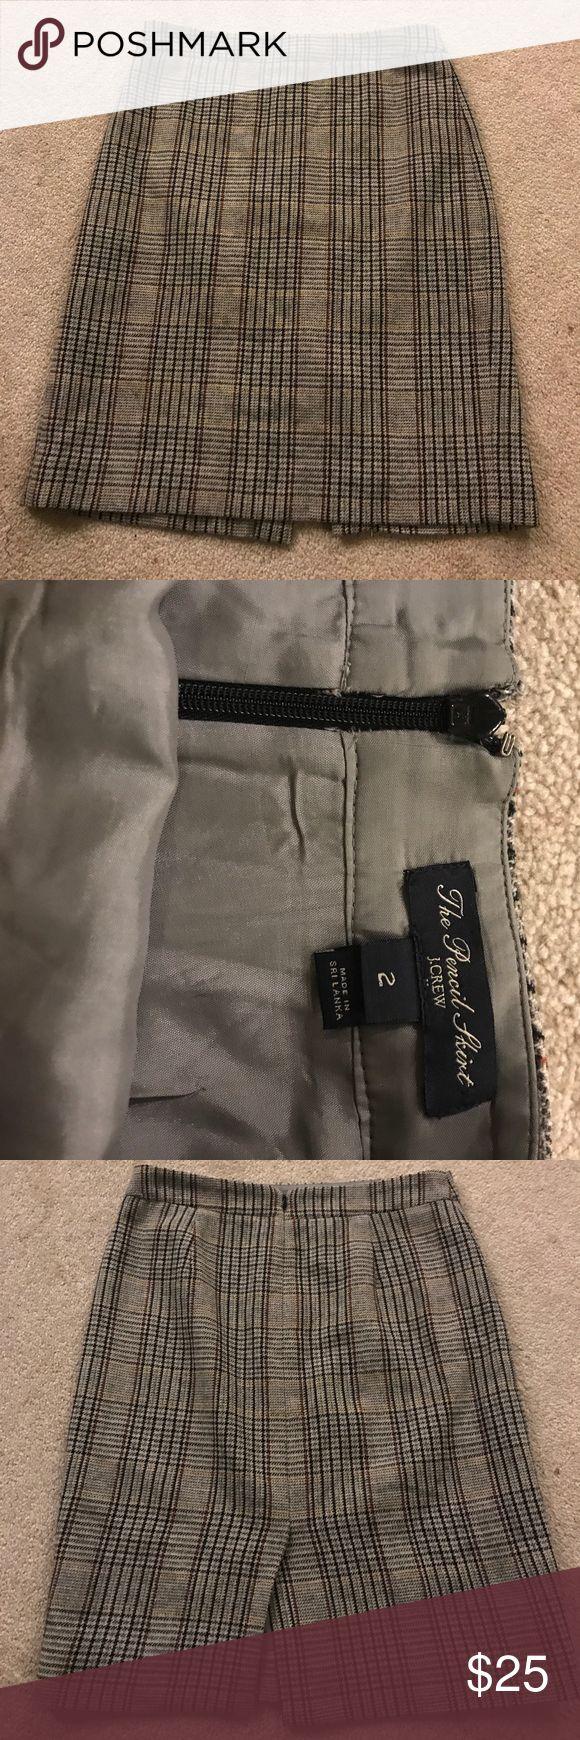 "Selling this J. Crew ""The Pencil Skirt"" khaki and plaid sz 2 on Poshmark! My username is: elmwoodrhodes. #shopmycloset #poshmark #fashion #shopping #style #forsale #J. Crew #Dresses & Skirts"